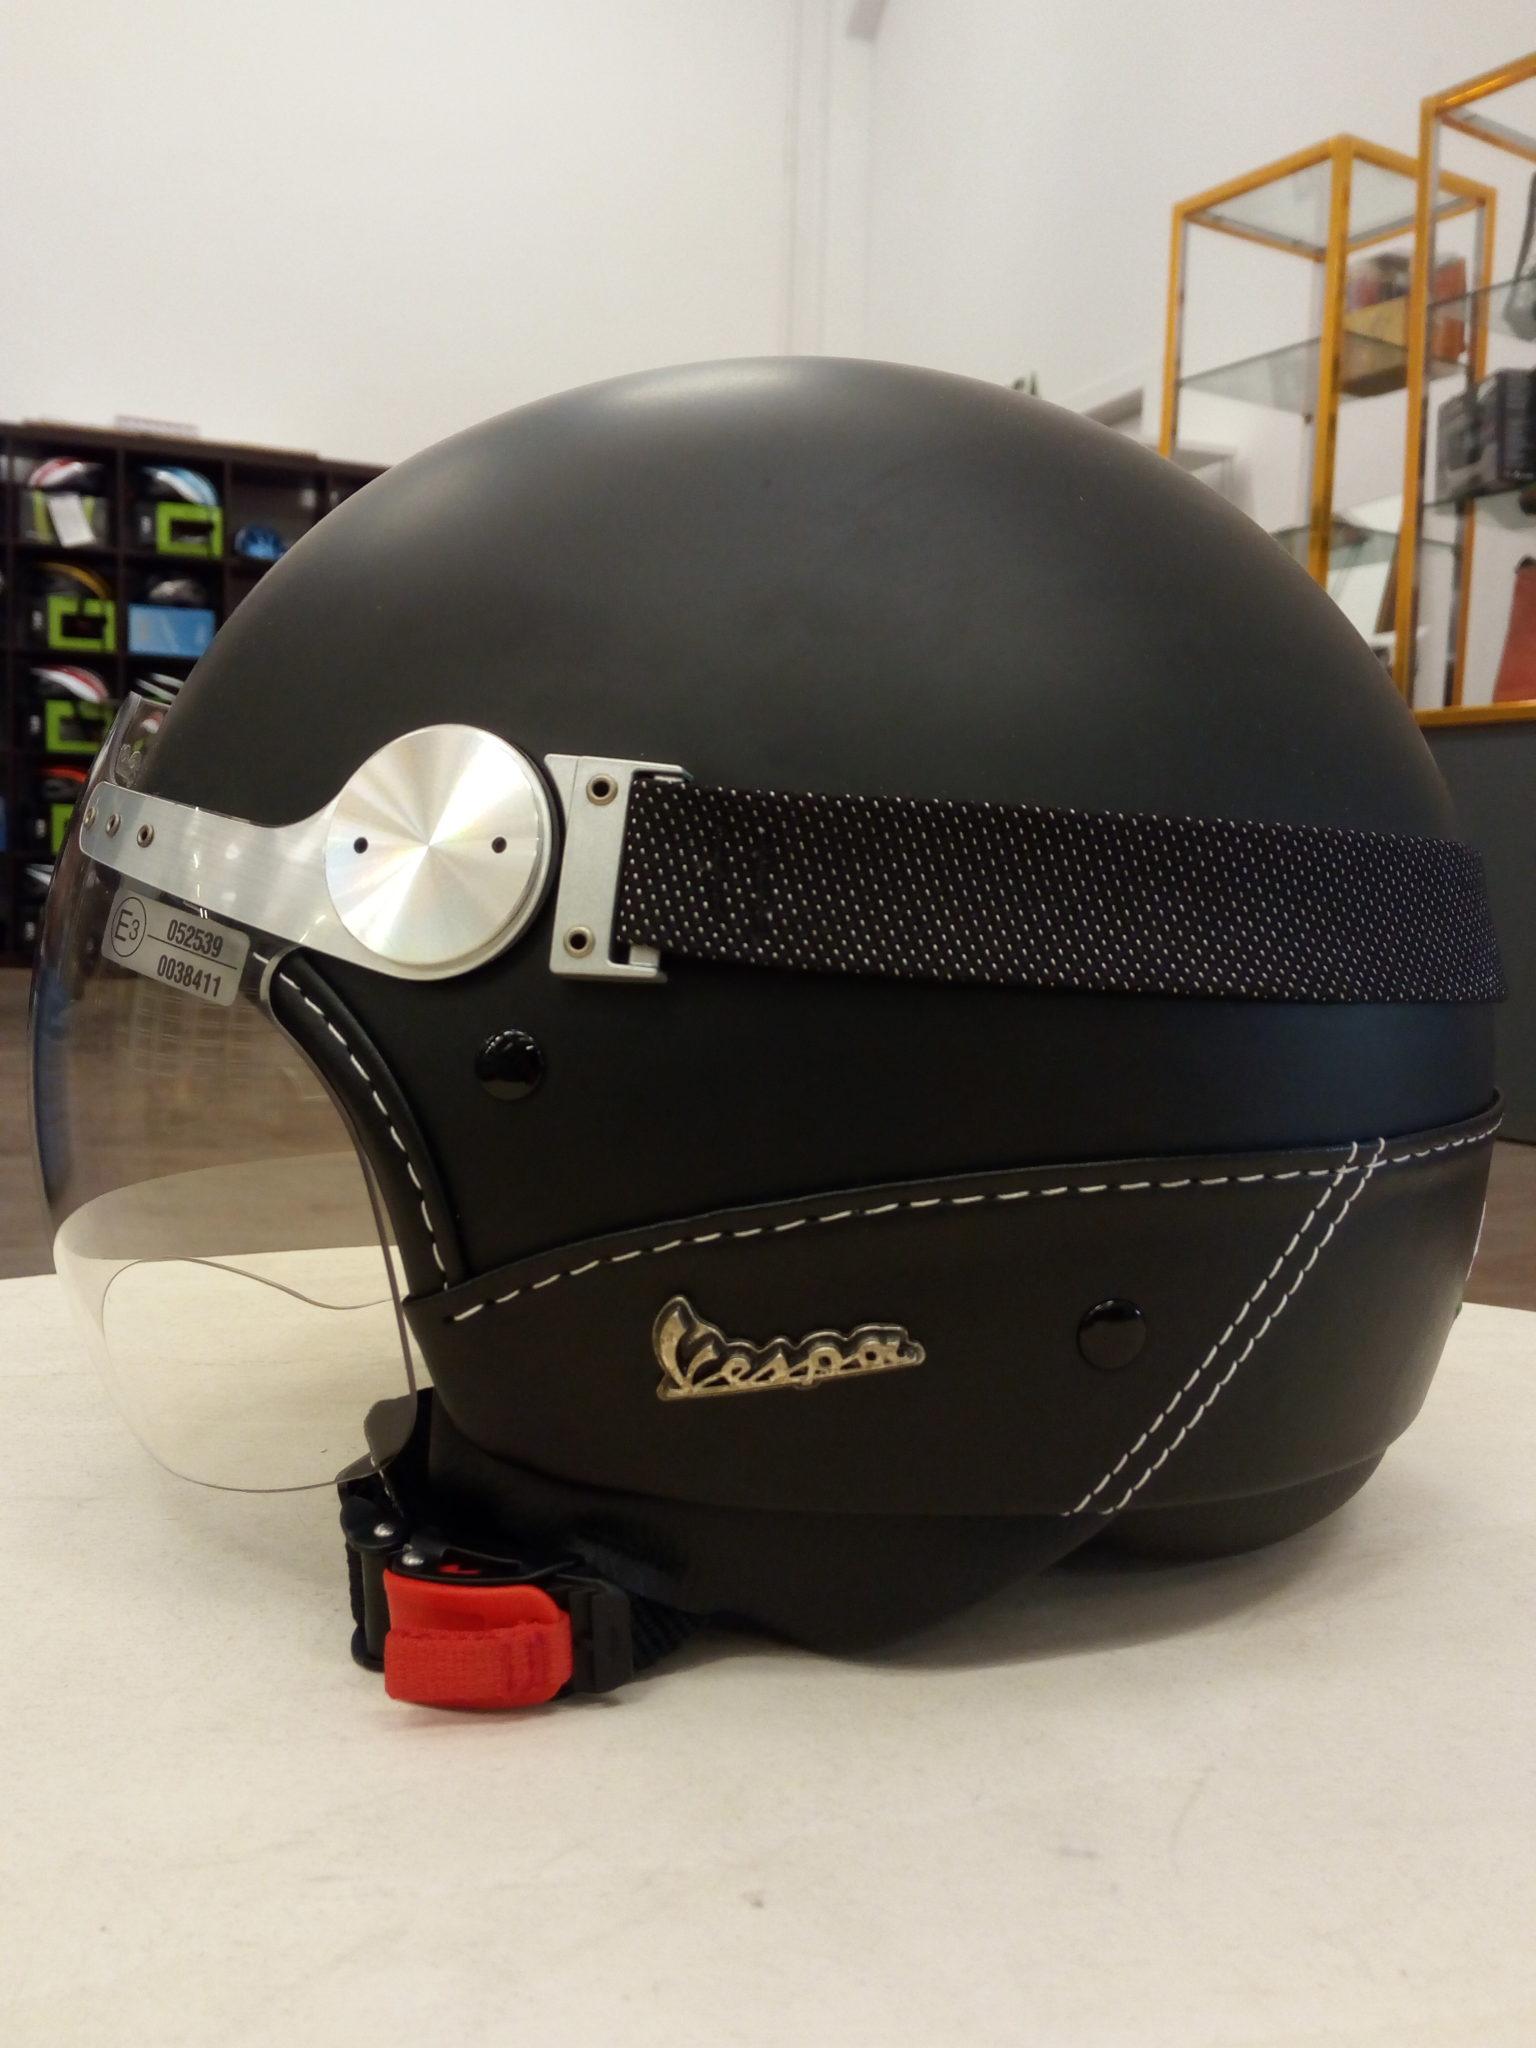 Casco di sicurezza per Vespa GT